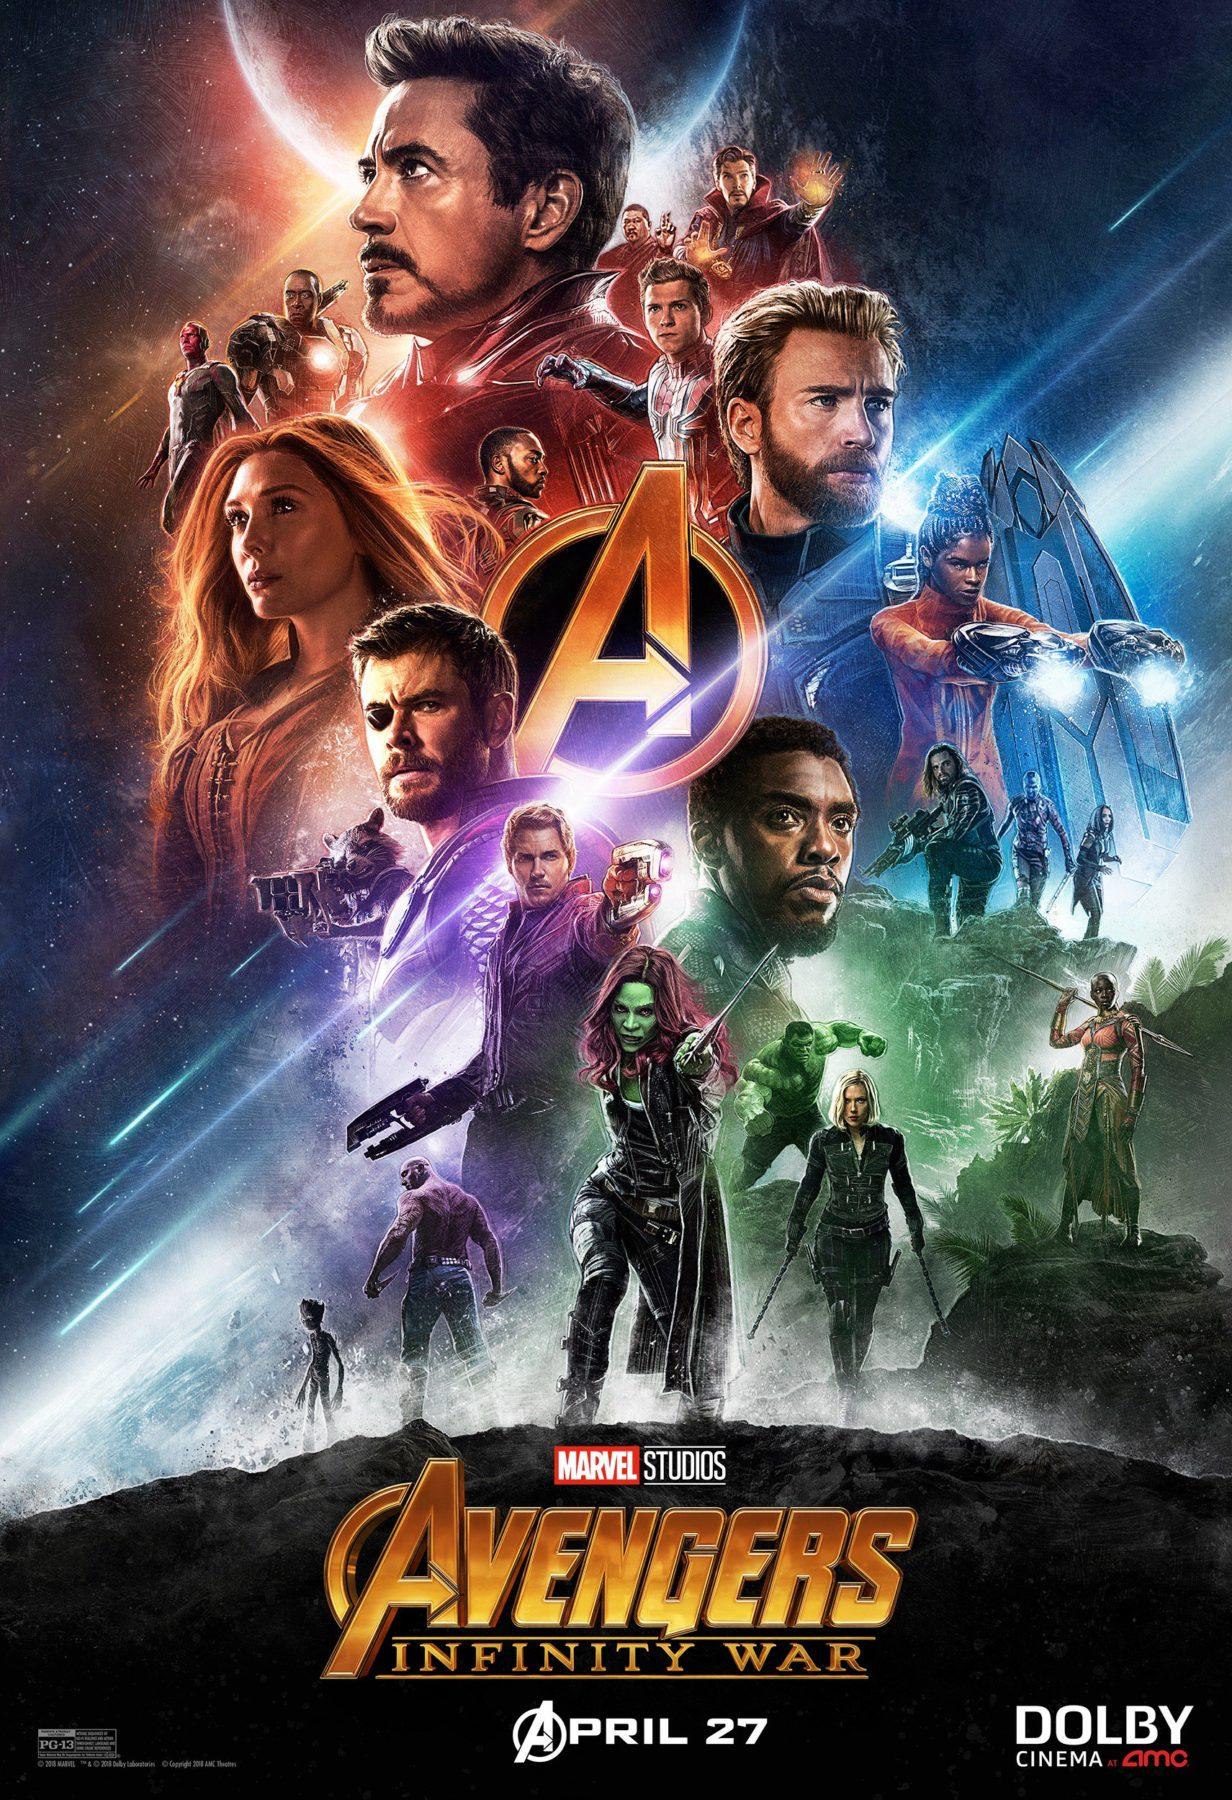 Marvel's Avengers: Infinity War recibe dos nuevos pósters